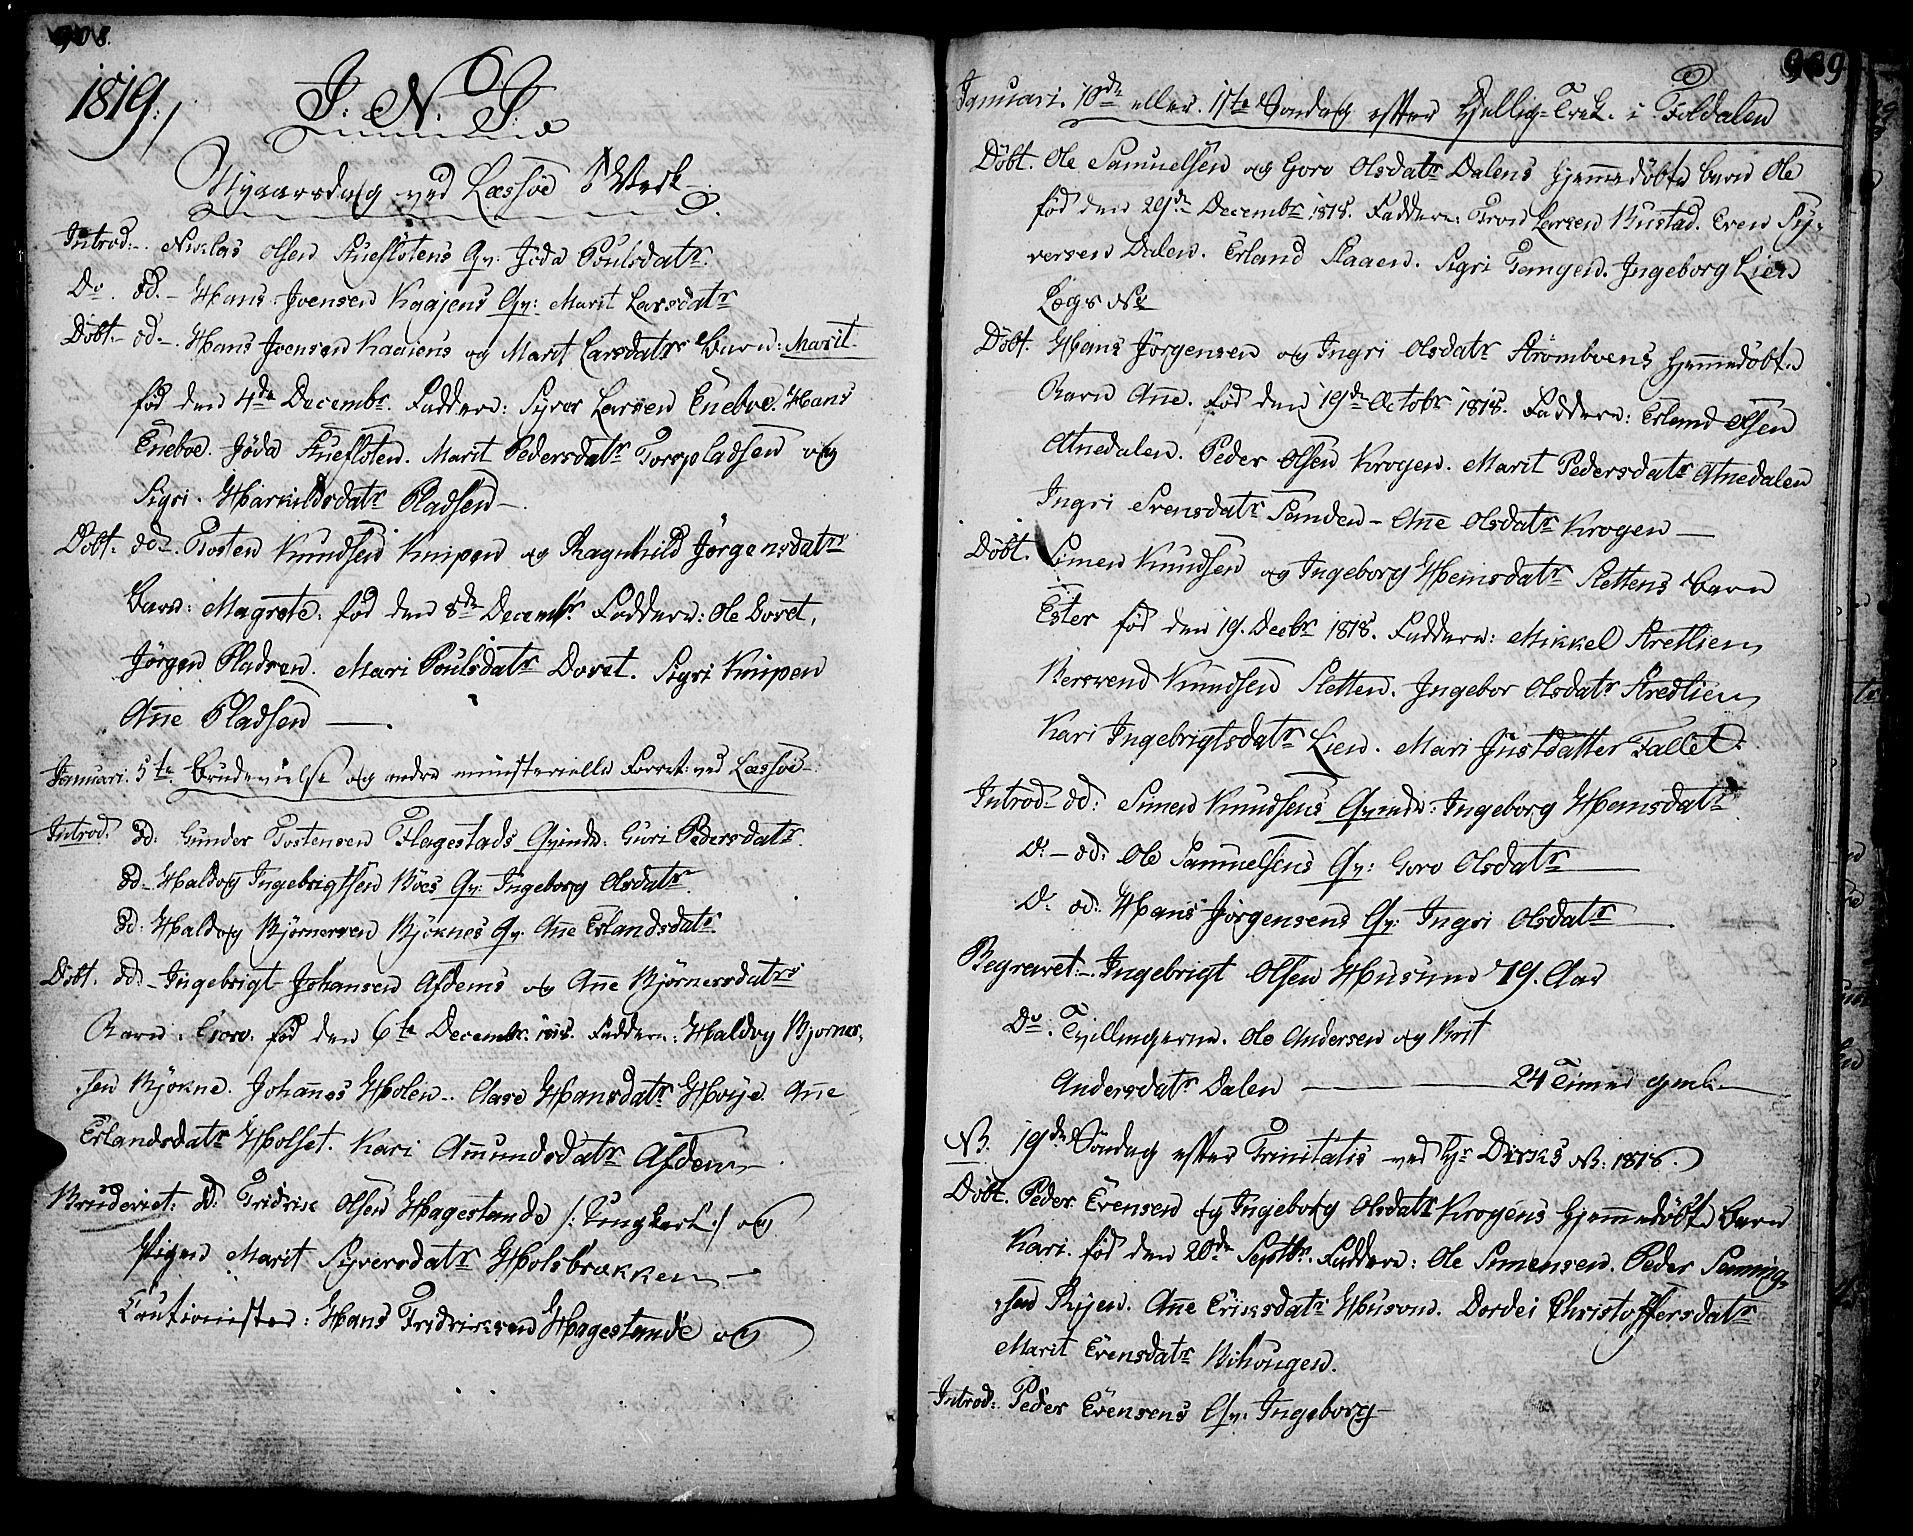 SAH, Lesja prestekontor, Ministerialbok nr. 3, 1777-1819, s. 908-909